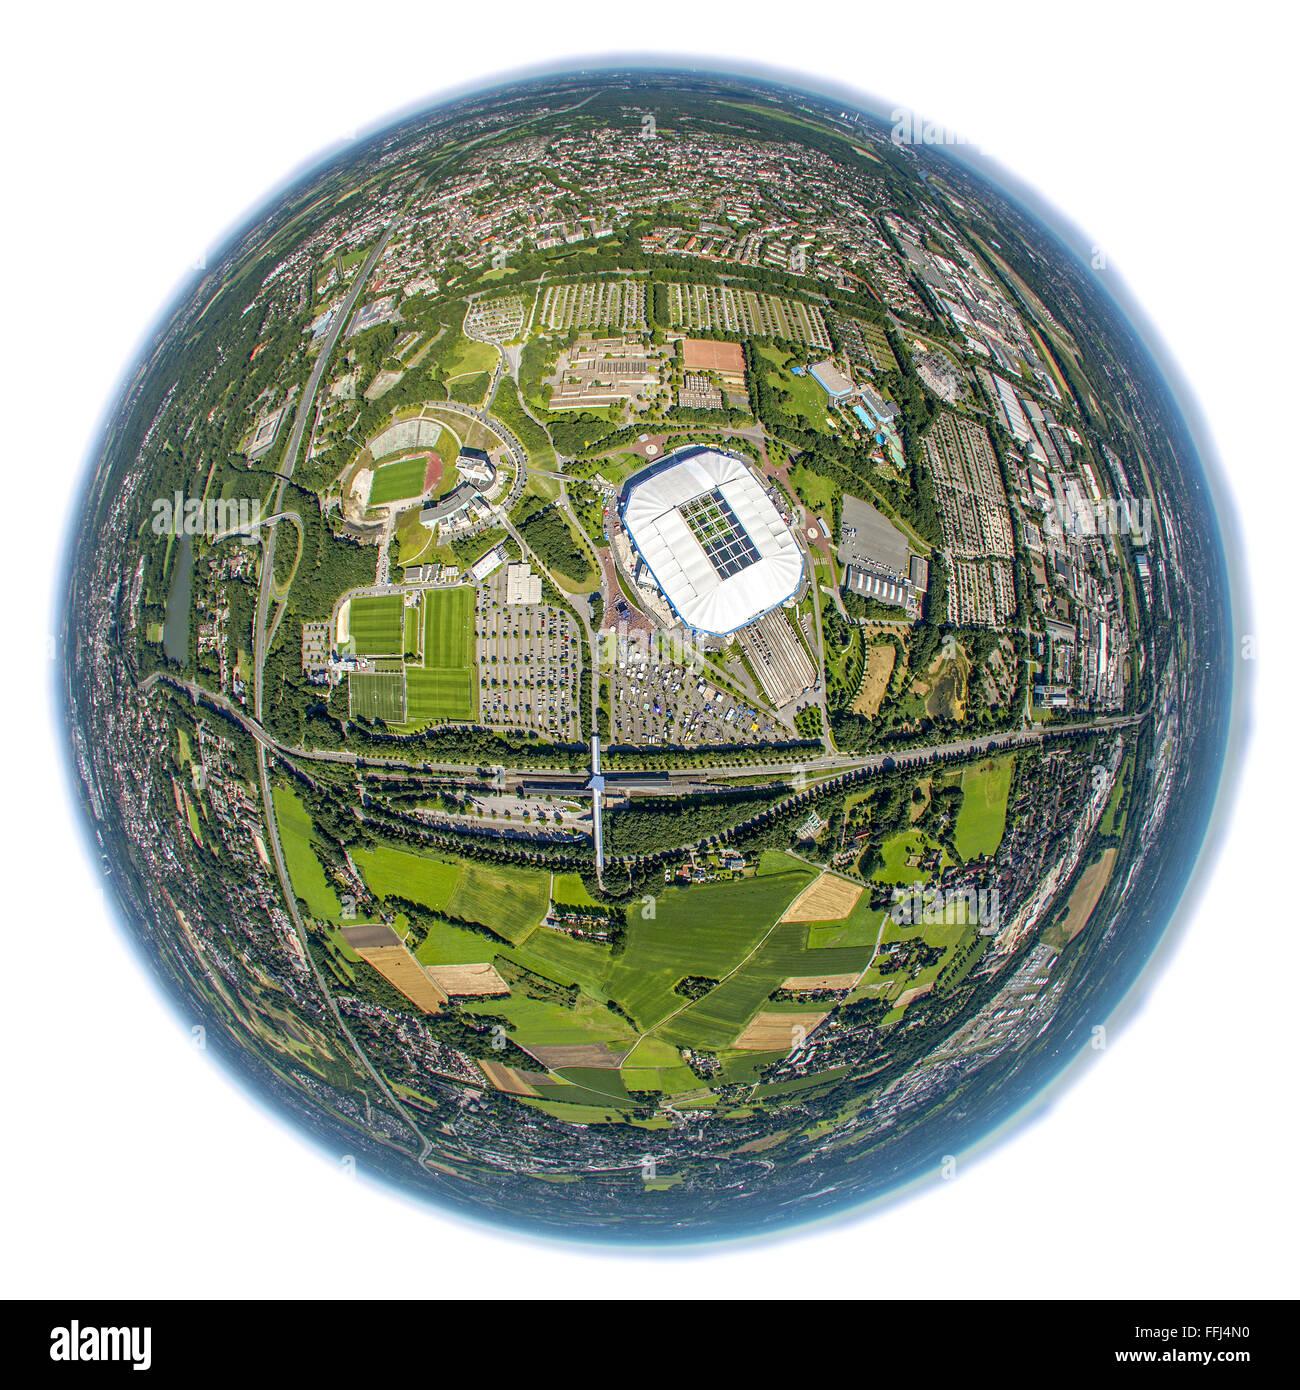 Aerial view, Veltins Arena, Veltins Arena, Schalke Arena, S04, national league, Schalke day at Schalke, fish eye - Stock Image